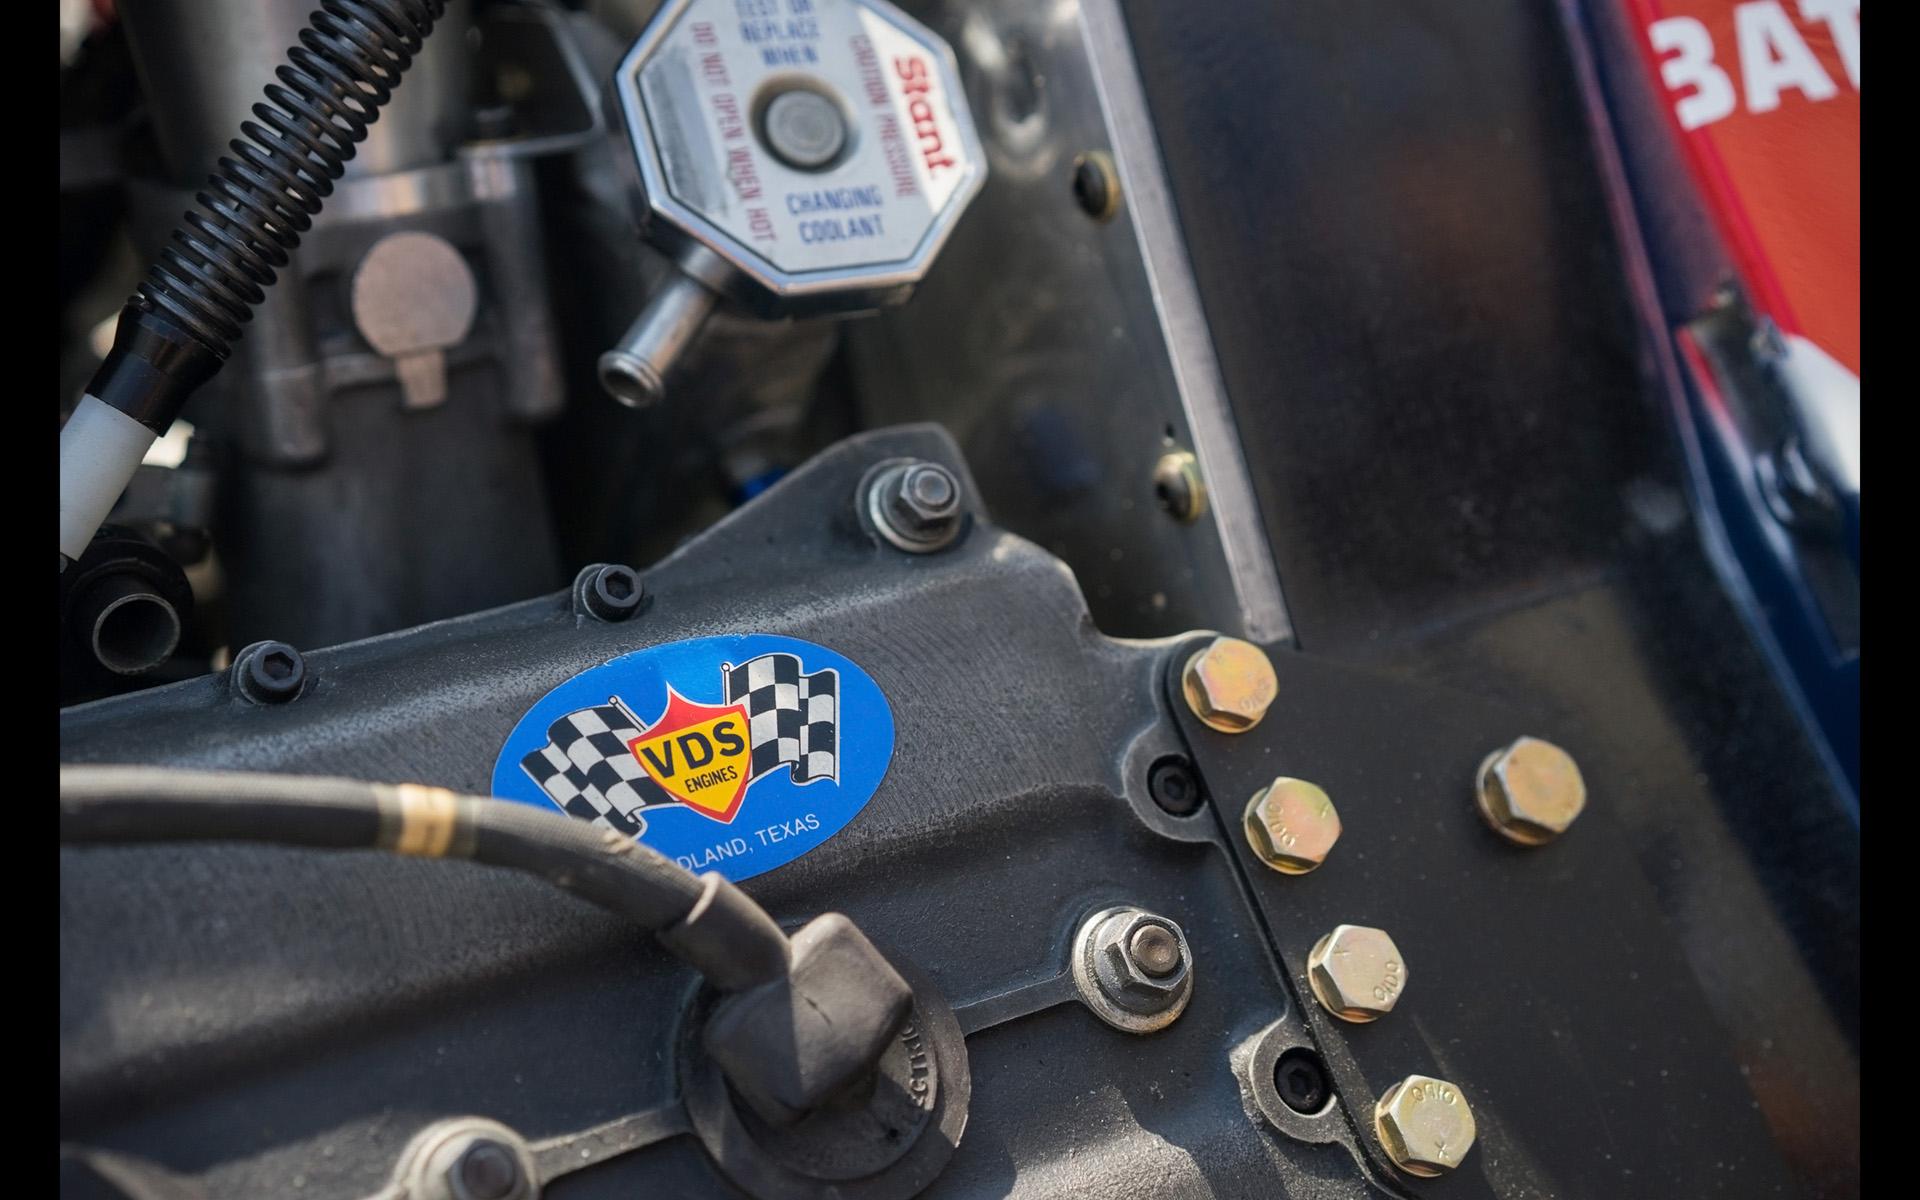 1990 Lola T9000 Valvoline Indy Car   Details   4   1920x1200 1920x1200